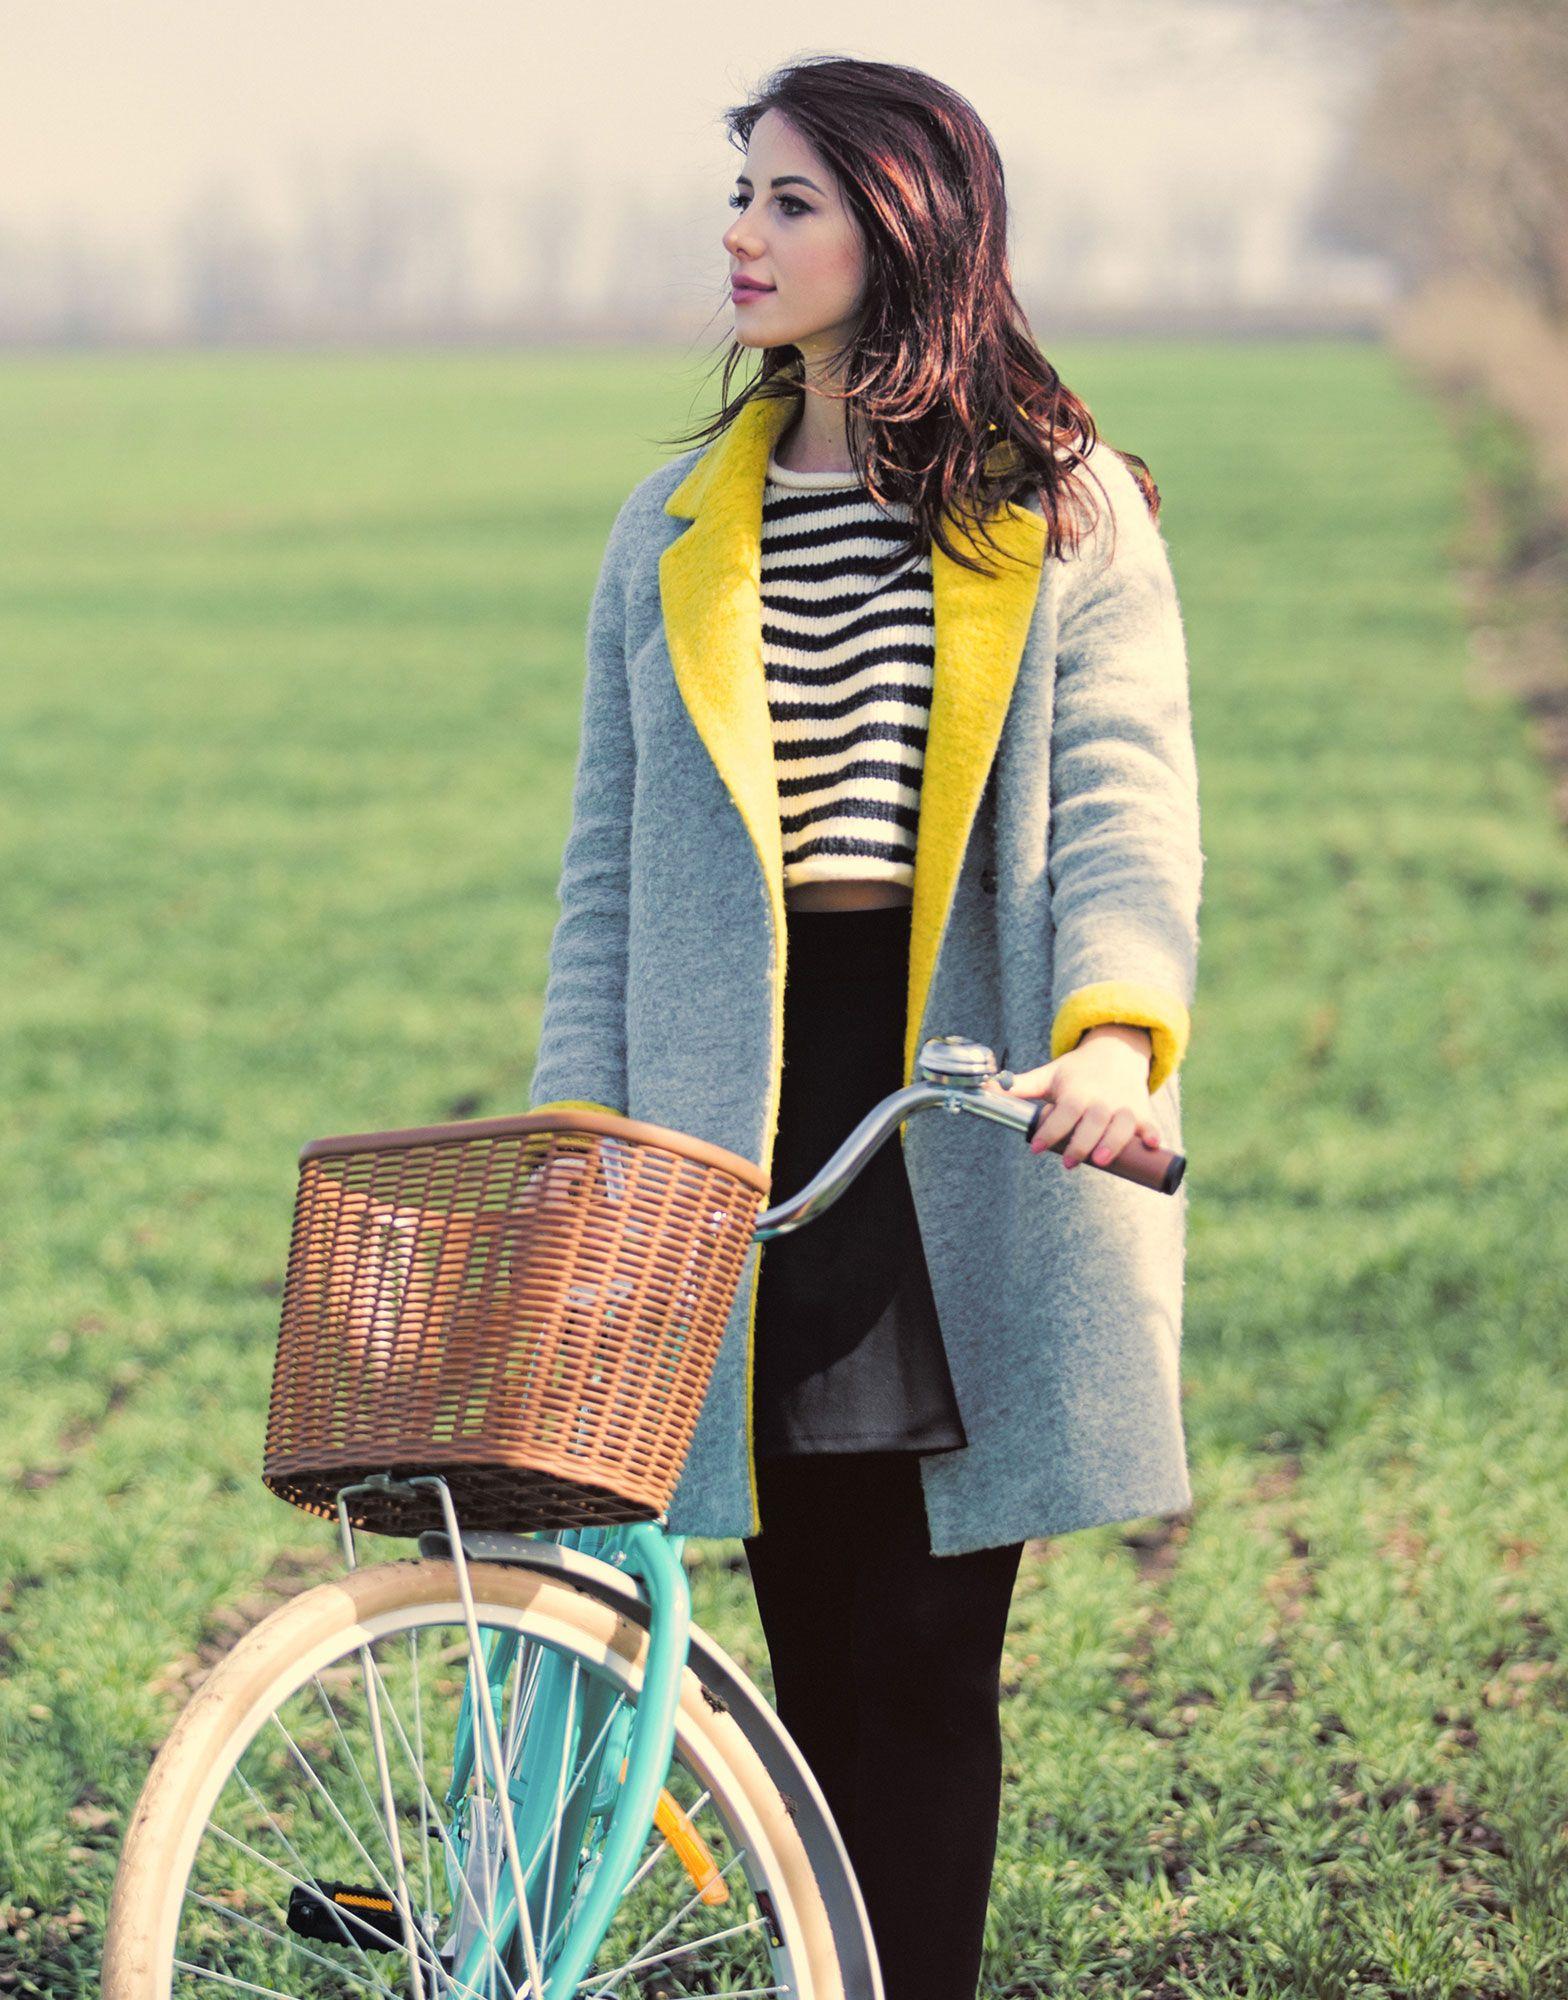 fashion gray autumn colors